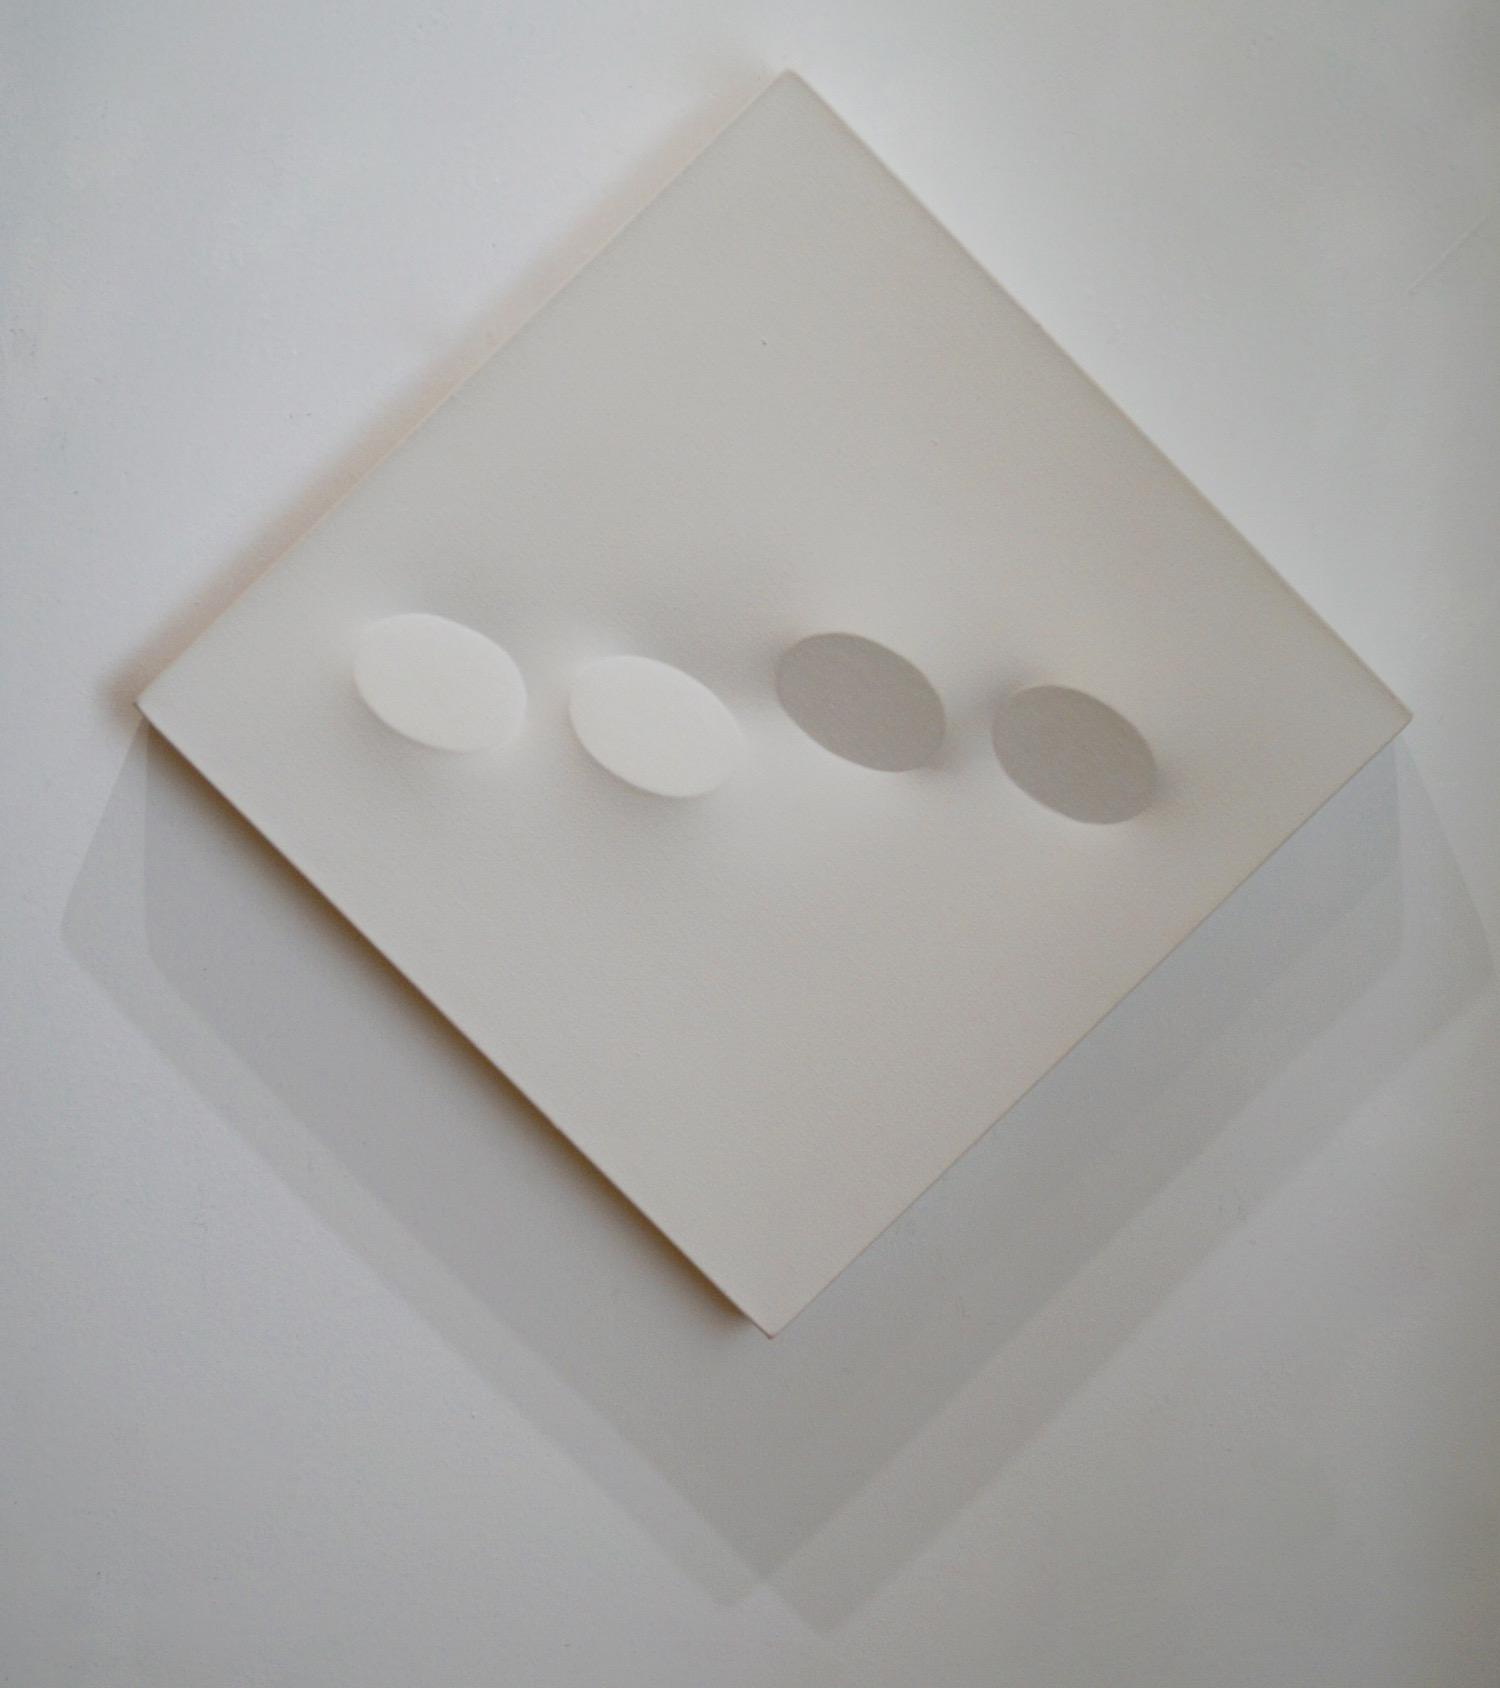 Turi Simeti Bianco, 1994 Acrylic on shaped canvas 50 x 50 cm   19 2/3 x 19 2/3 in